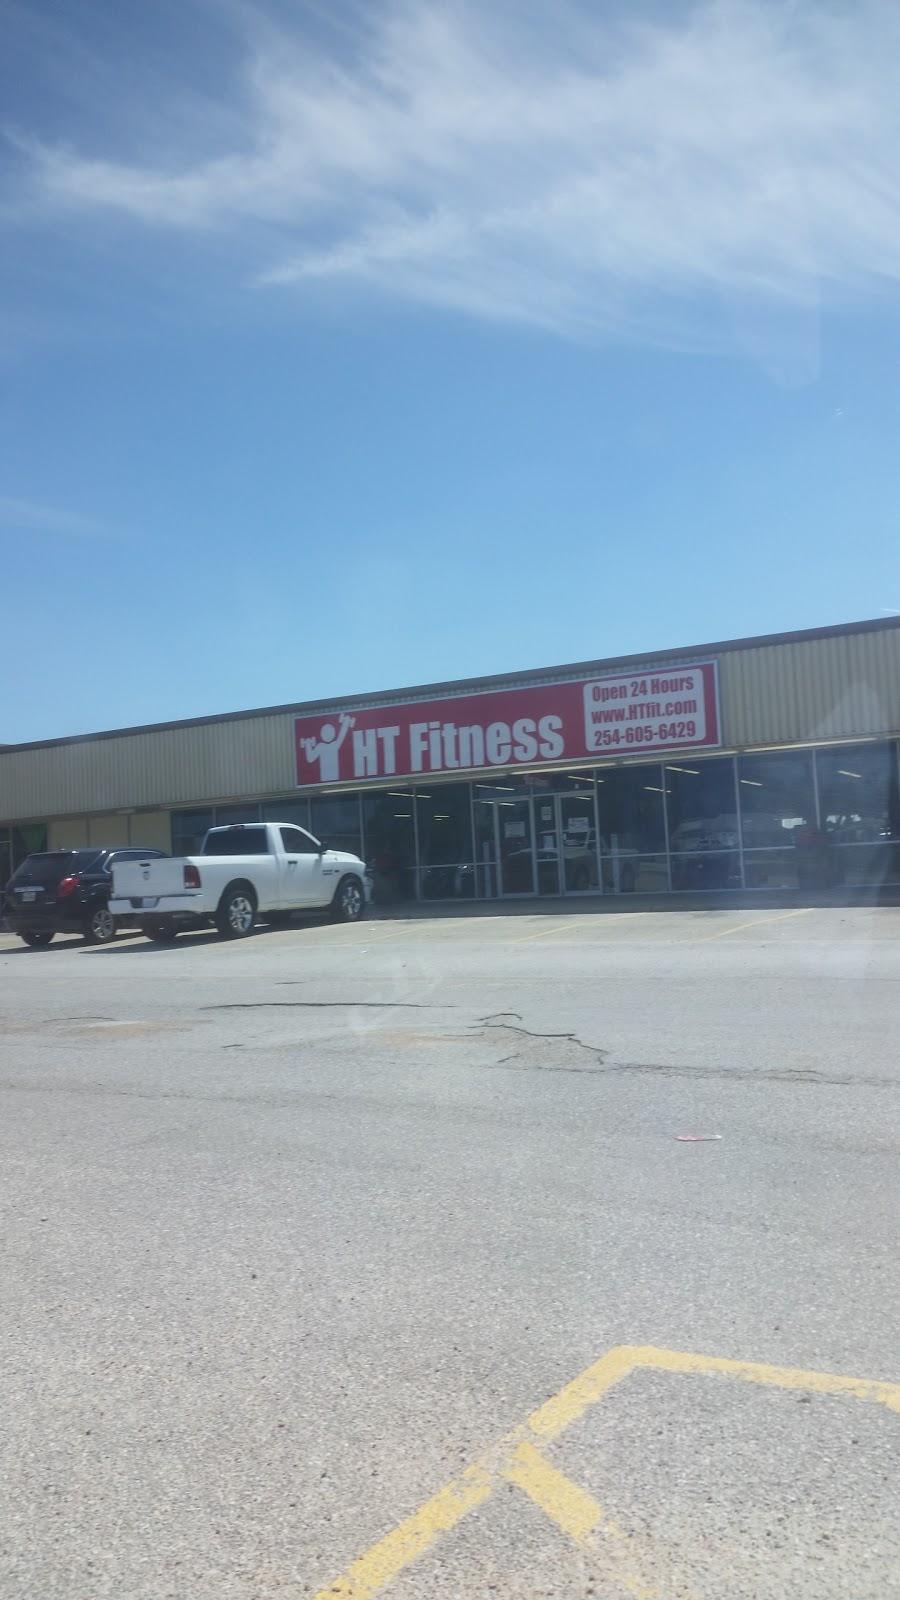 HT Fitness - gym  | Photo 8 of 10 | Address: 1600 W 4th St, Cameron, TX 76520, USA | Phone: (254) 605-6429